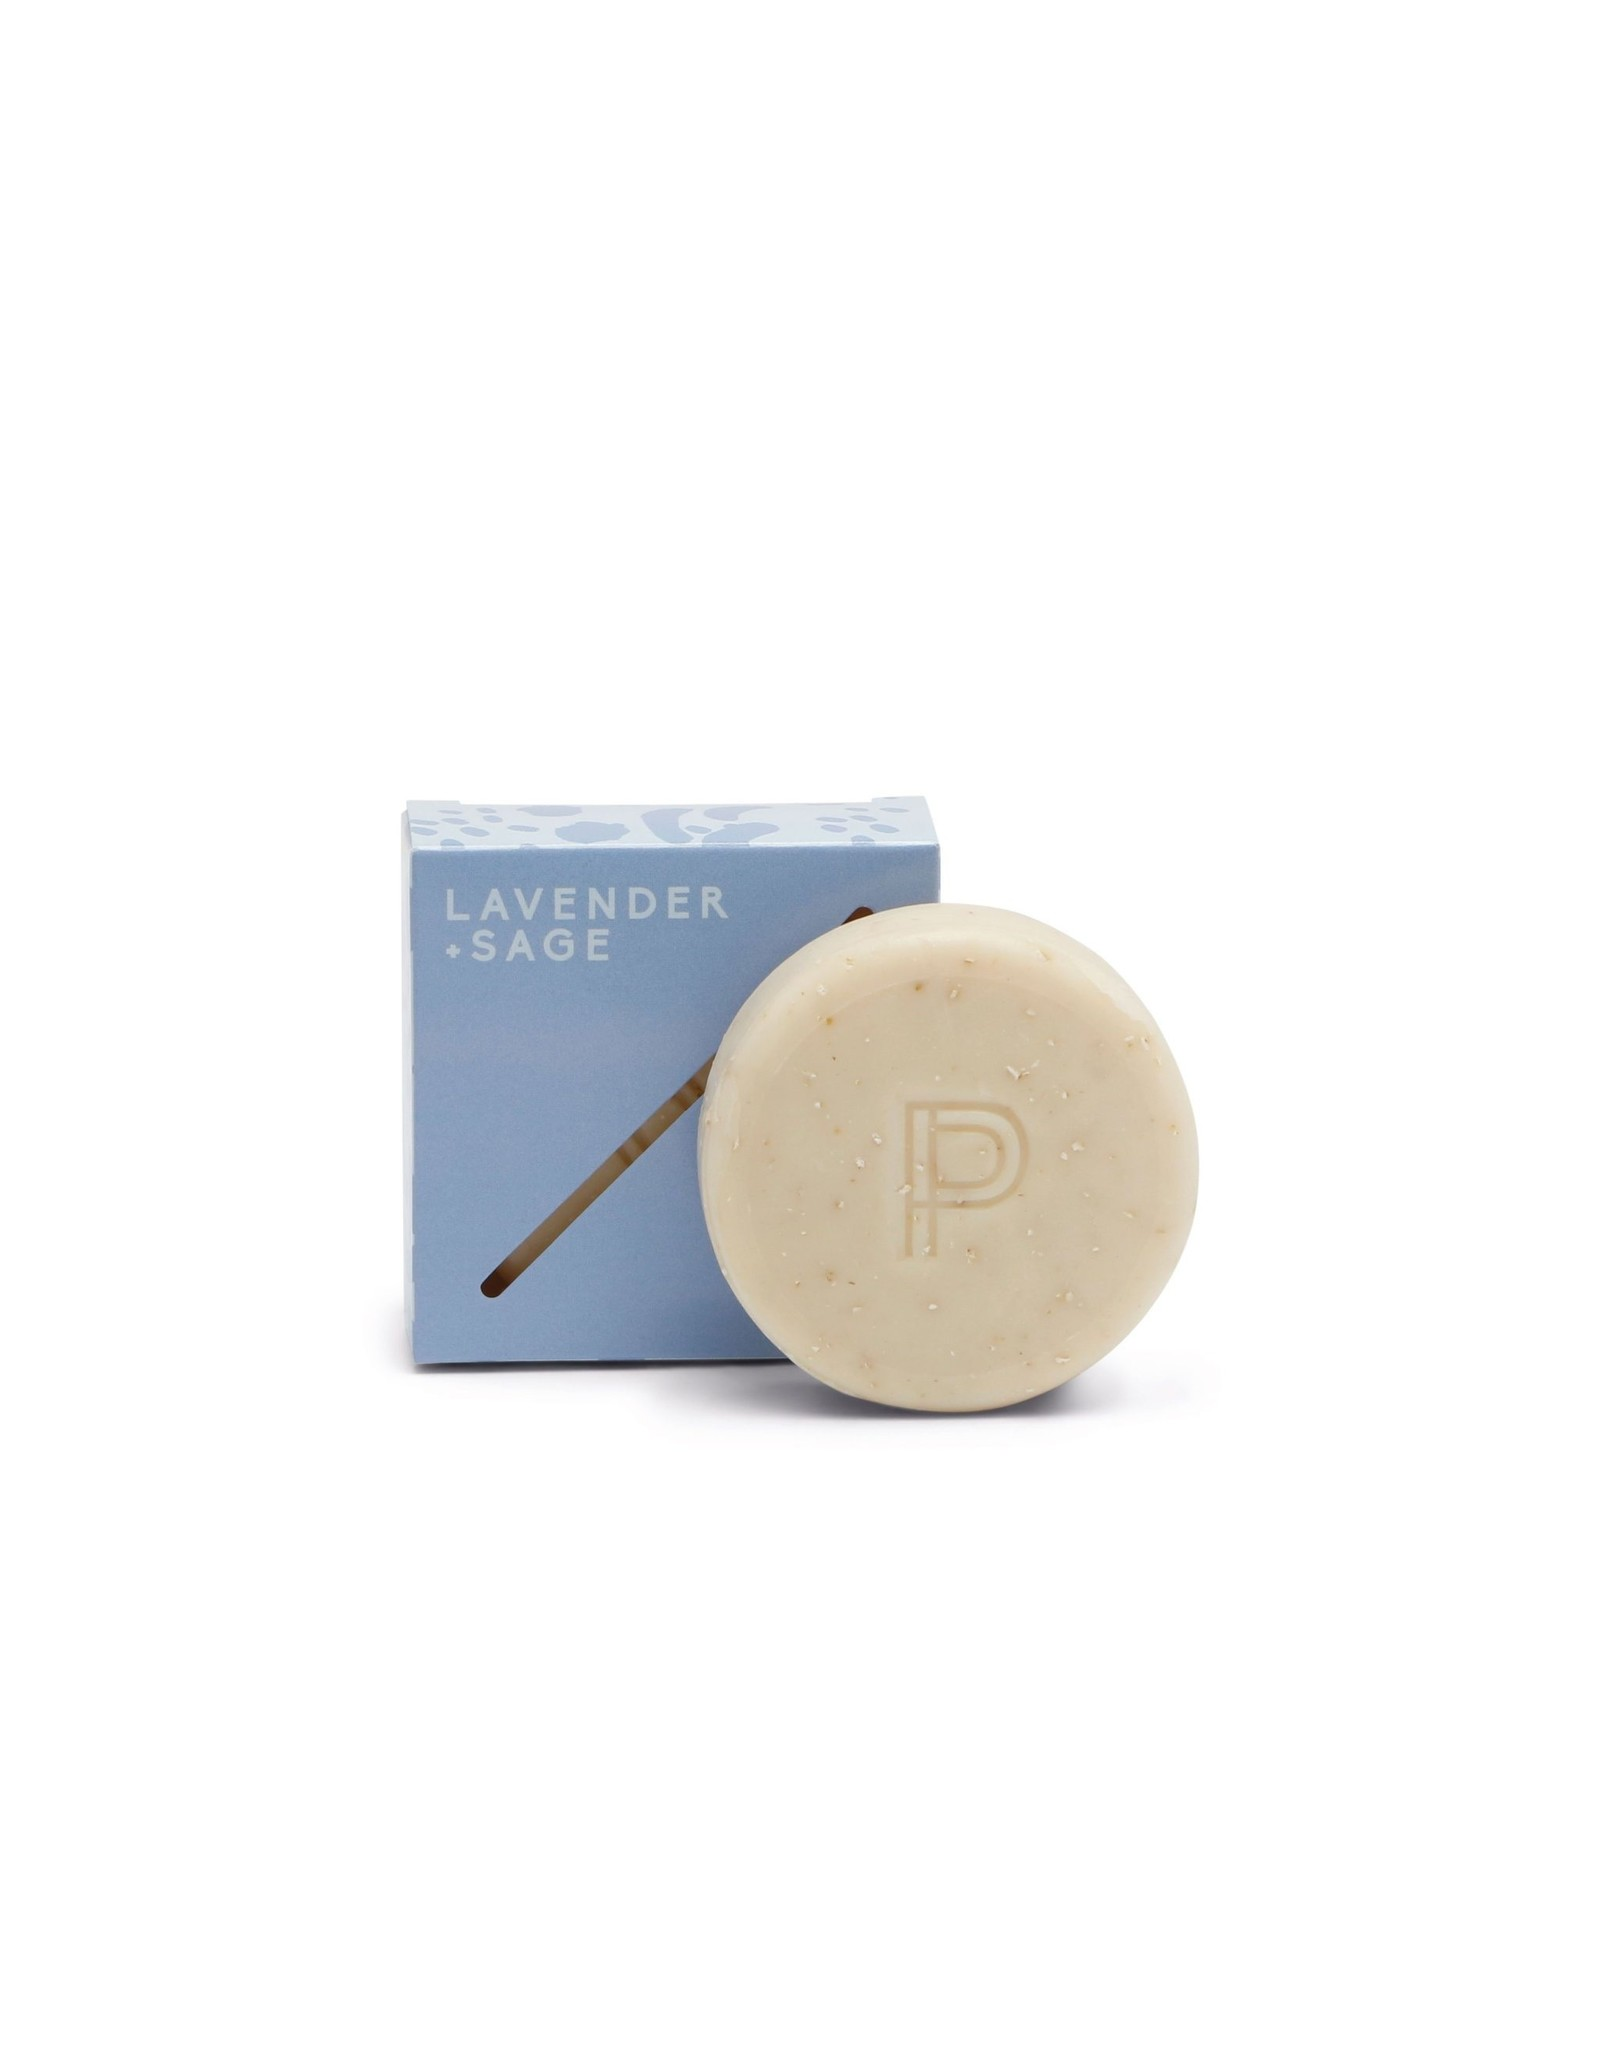 Oak + Arrow Interiors Oatmeal Bar Soap - Lavender & Sage